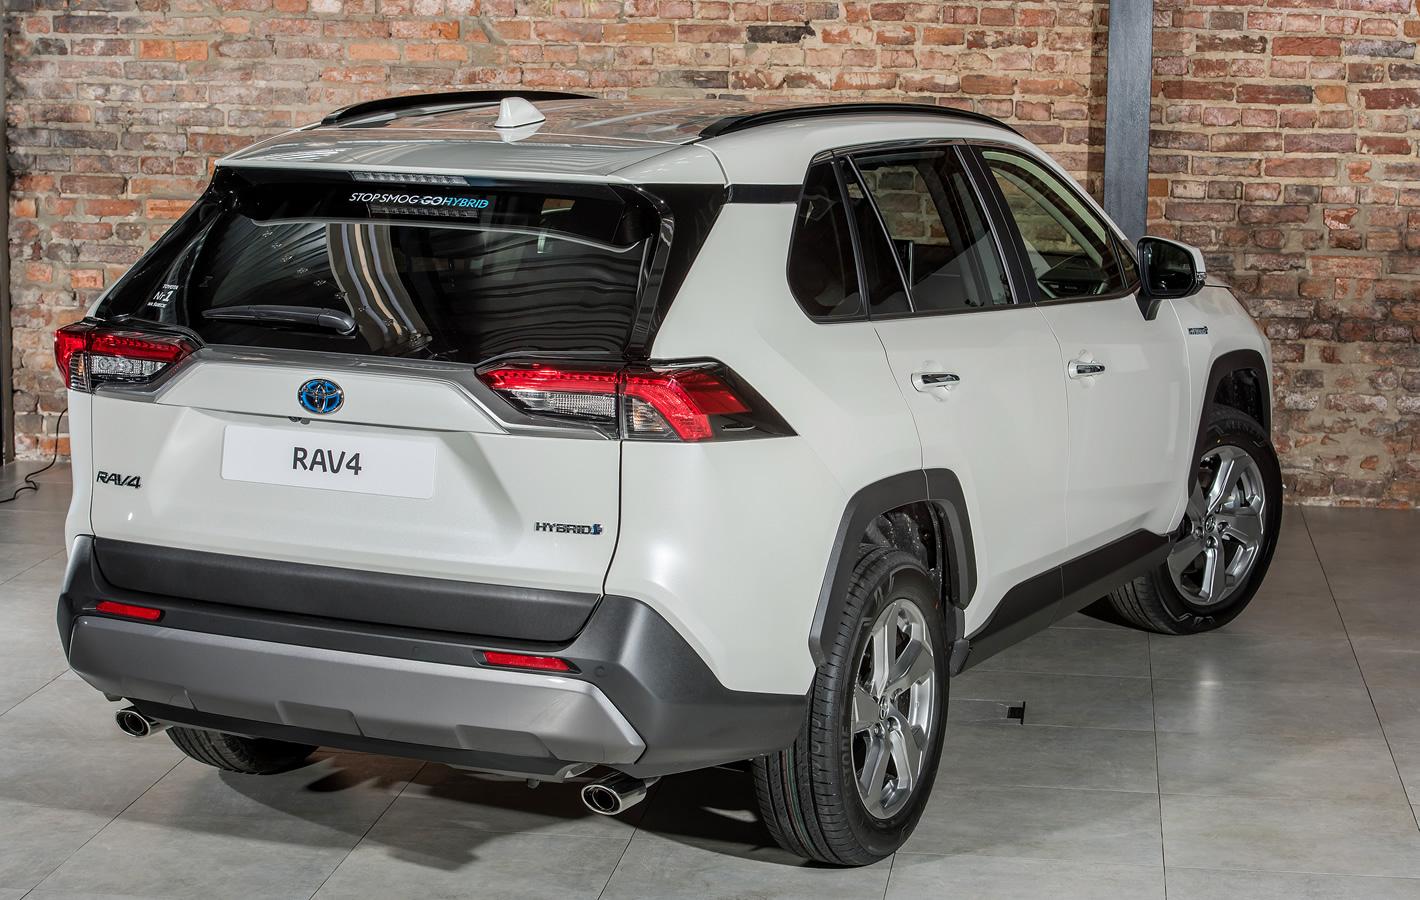 Toyota RAV4 2019 - ekran komputera